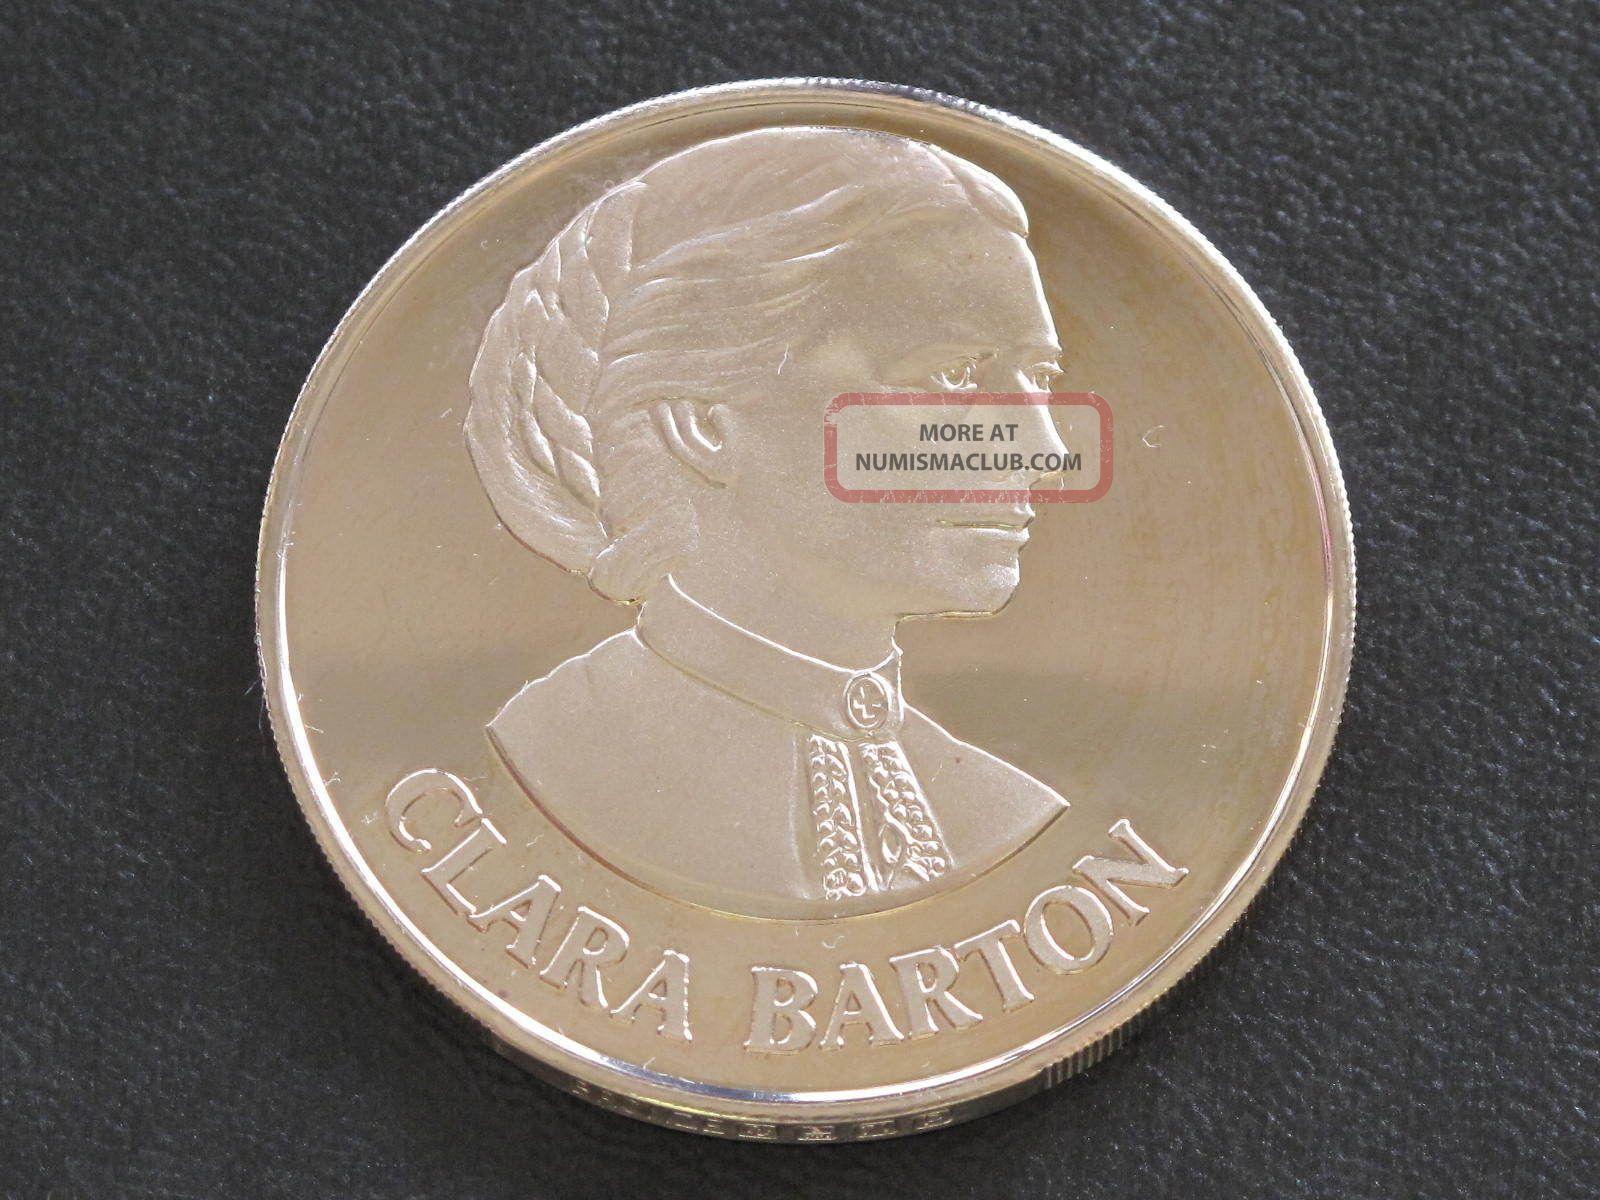 Clara Barton Proof - Quality Solid Bronze Medal Danbury D0379 Exonumia photo